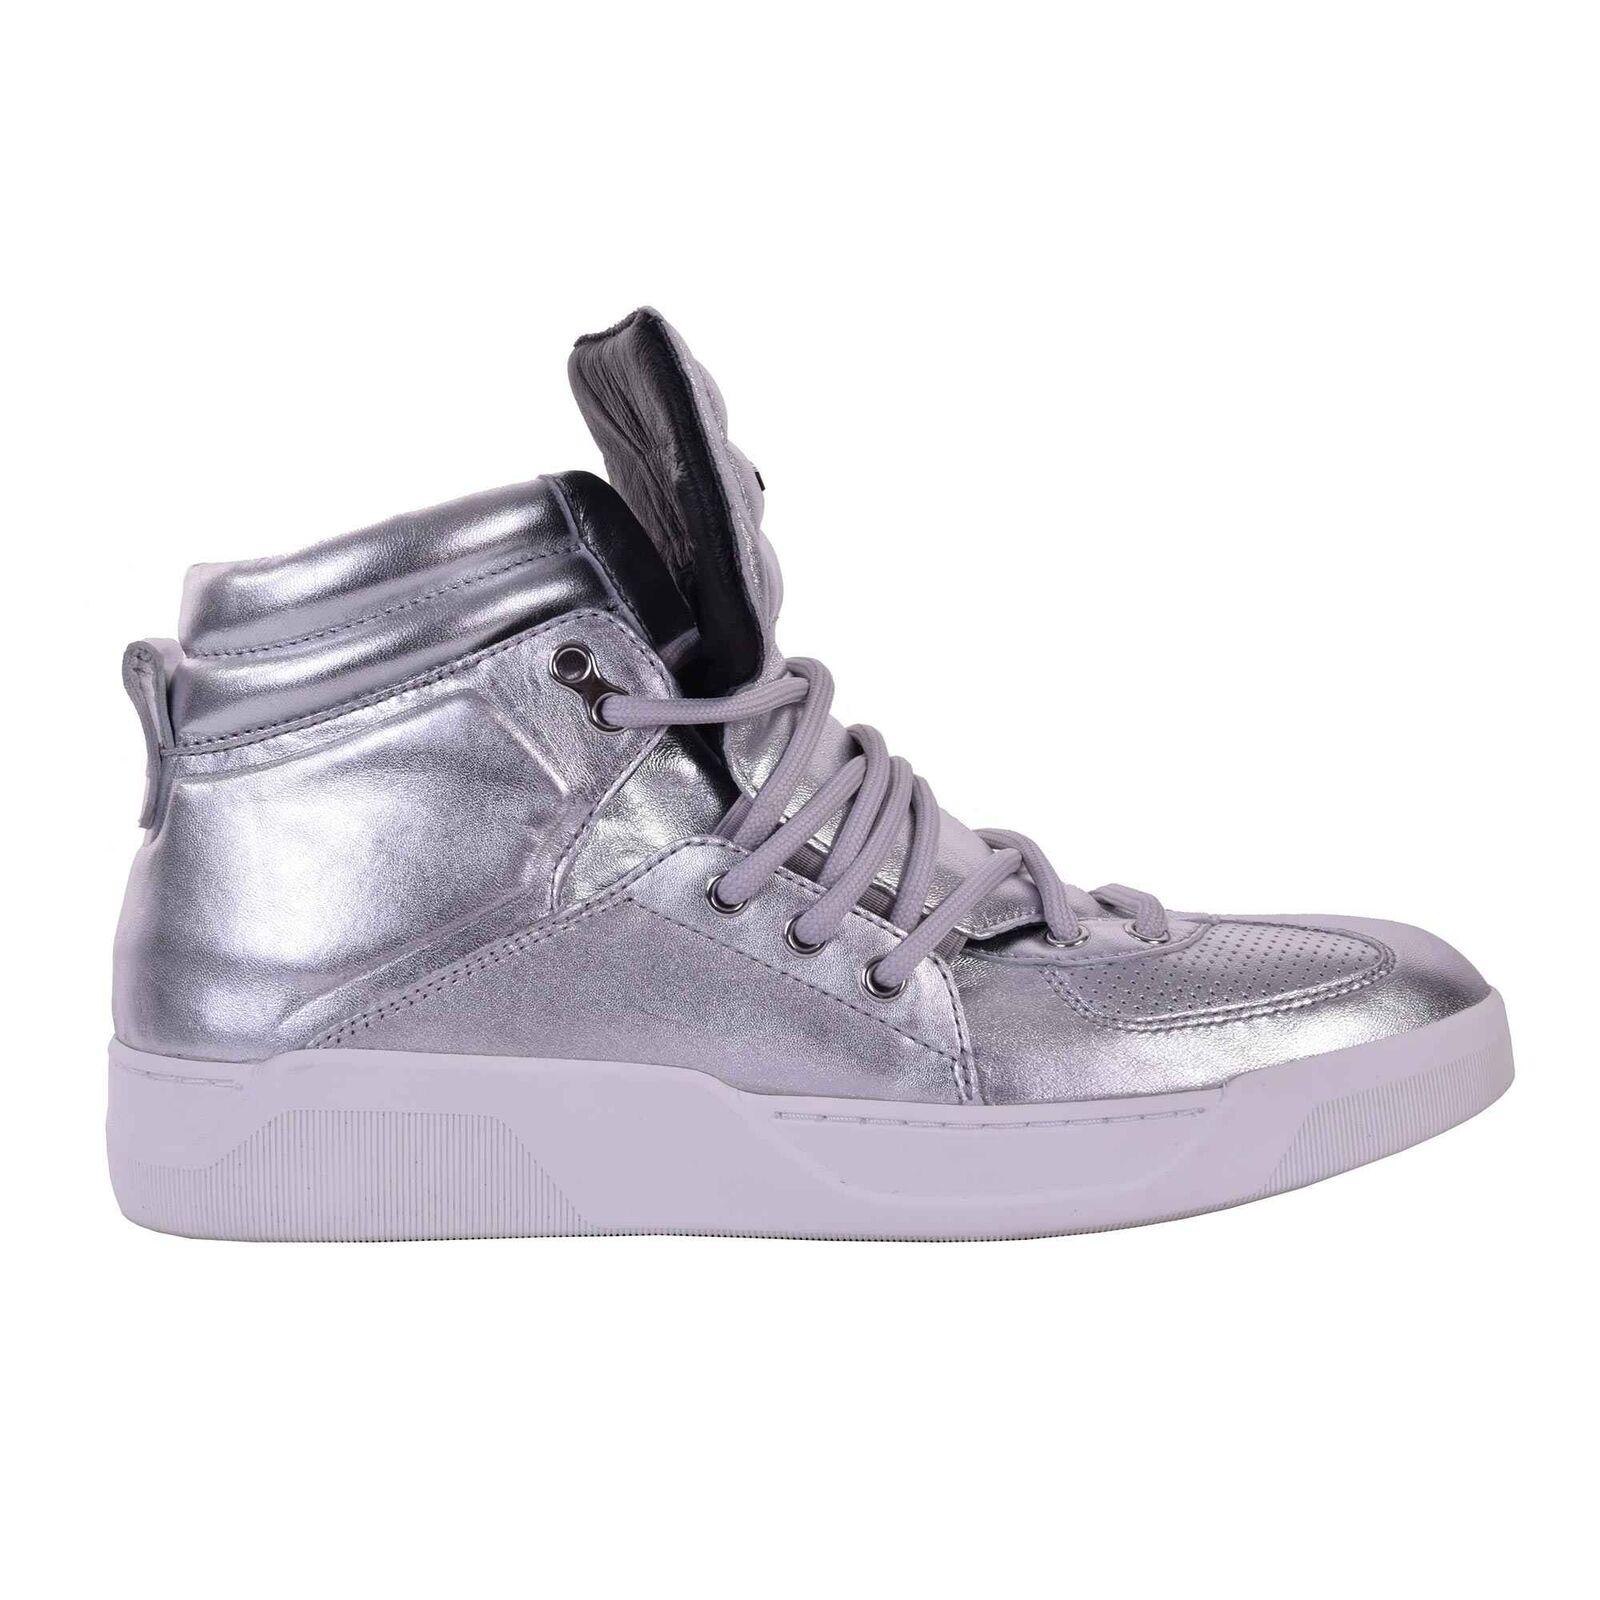 DOLCE & GABBANA Nappa Leder High-Top Sneakers Schuhe BENELUX Silber Grau 05936